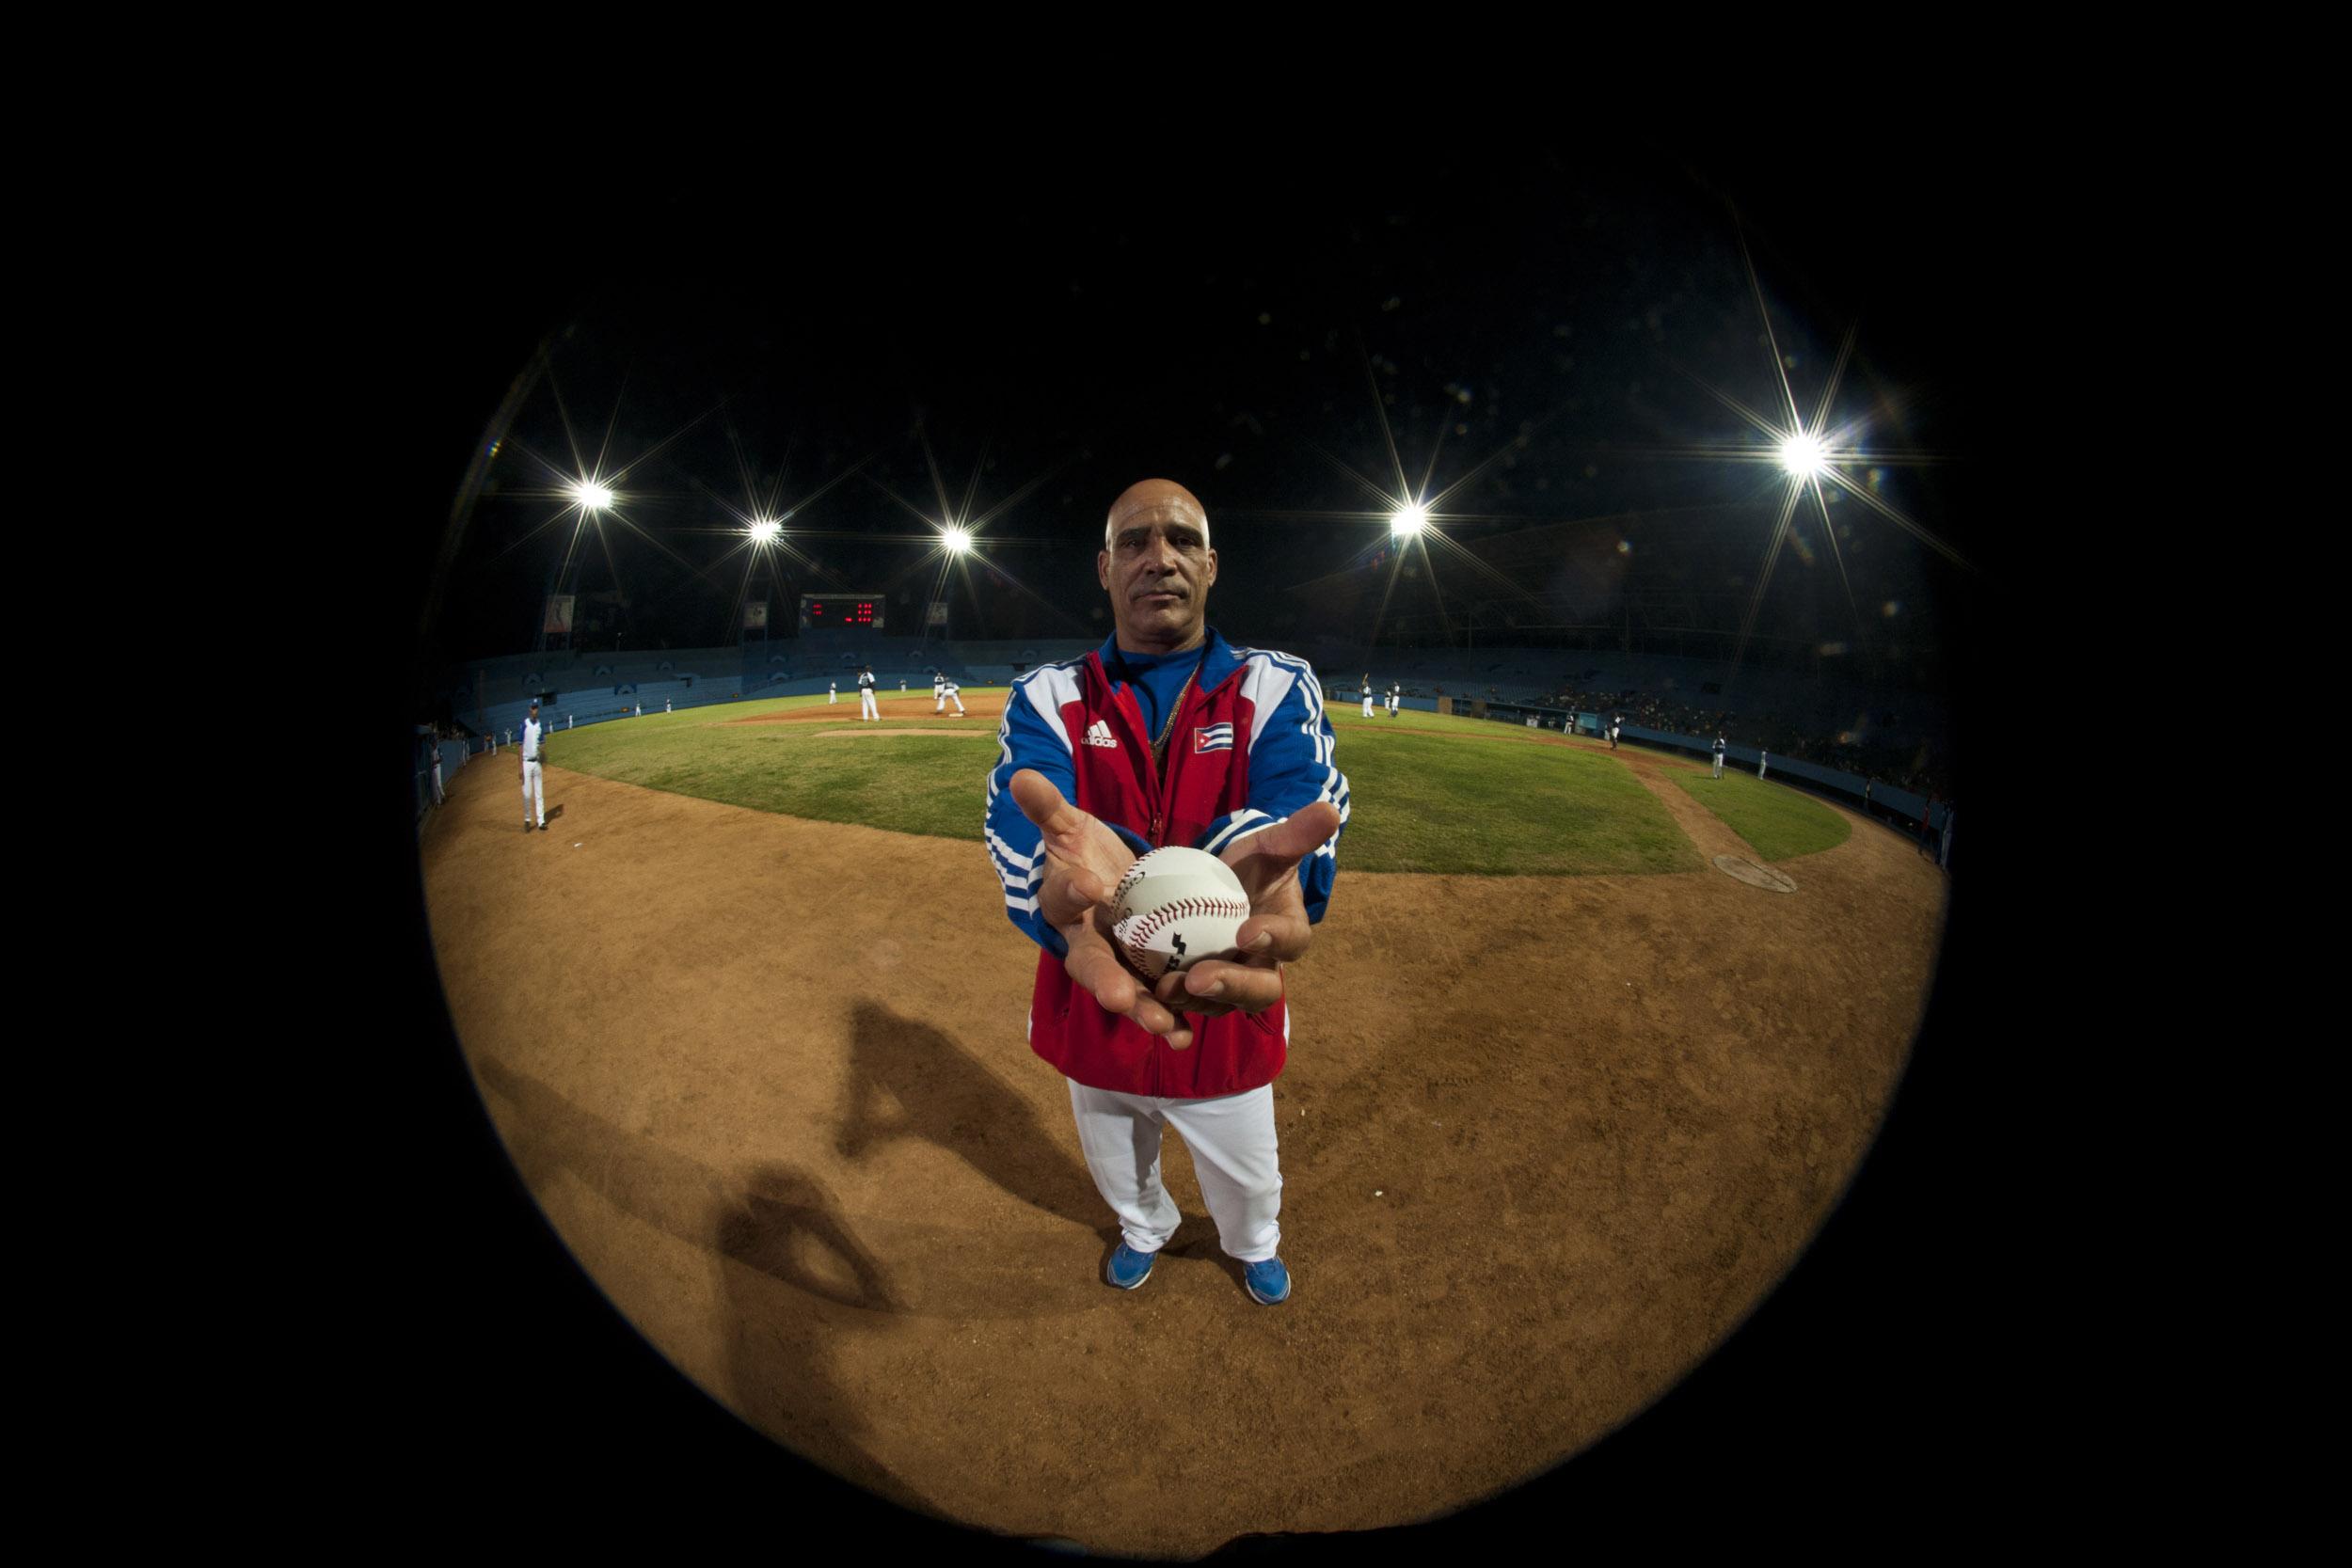 Lázaro Vargas, athlete - Illuminated Cuba - Hector Garrido, Aerial and human photography